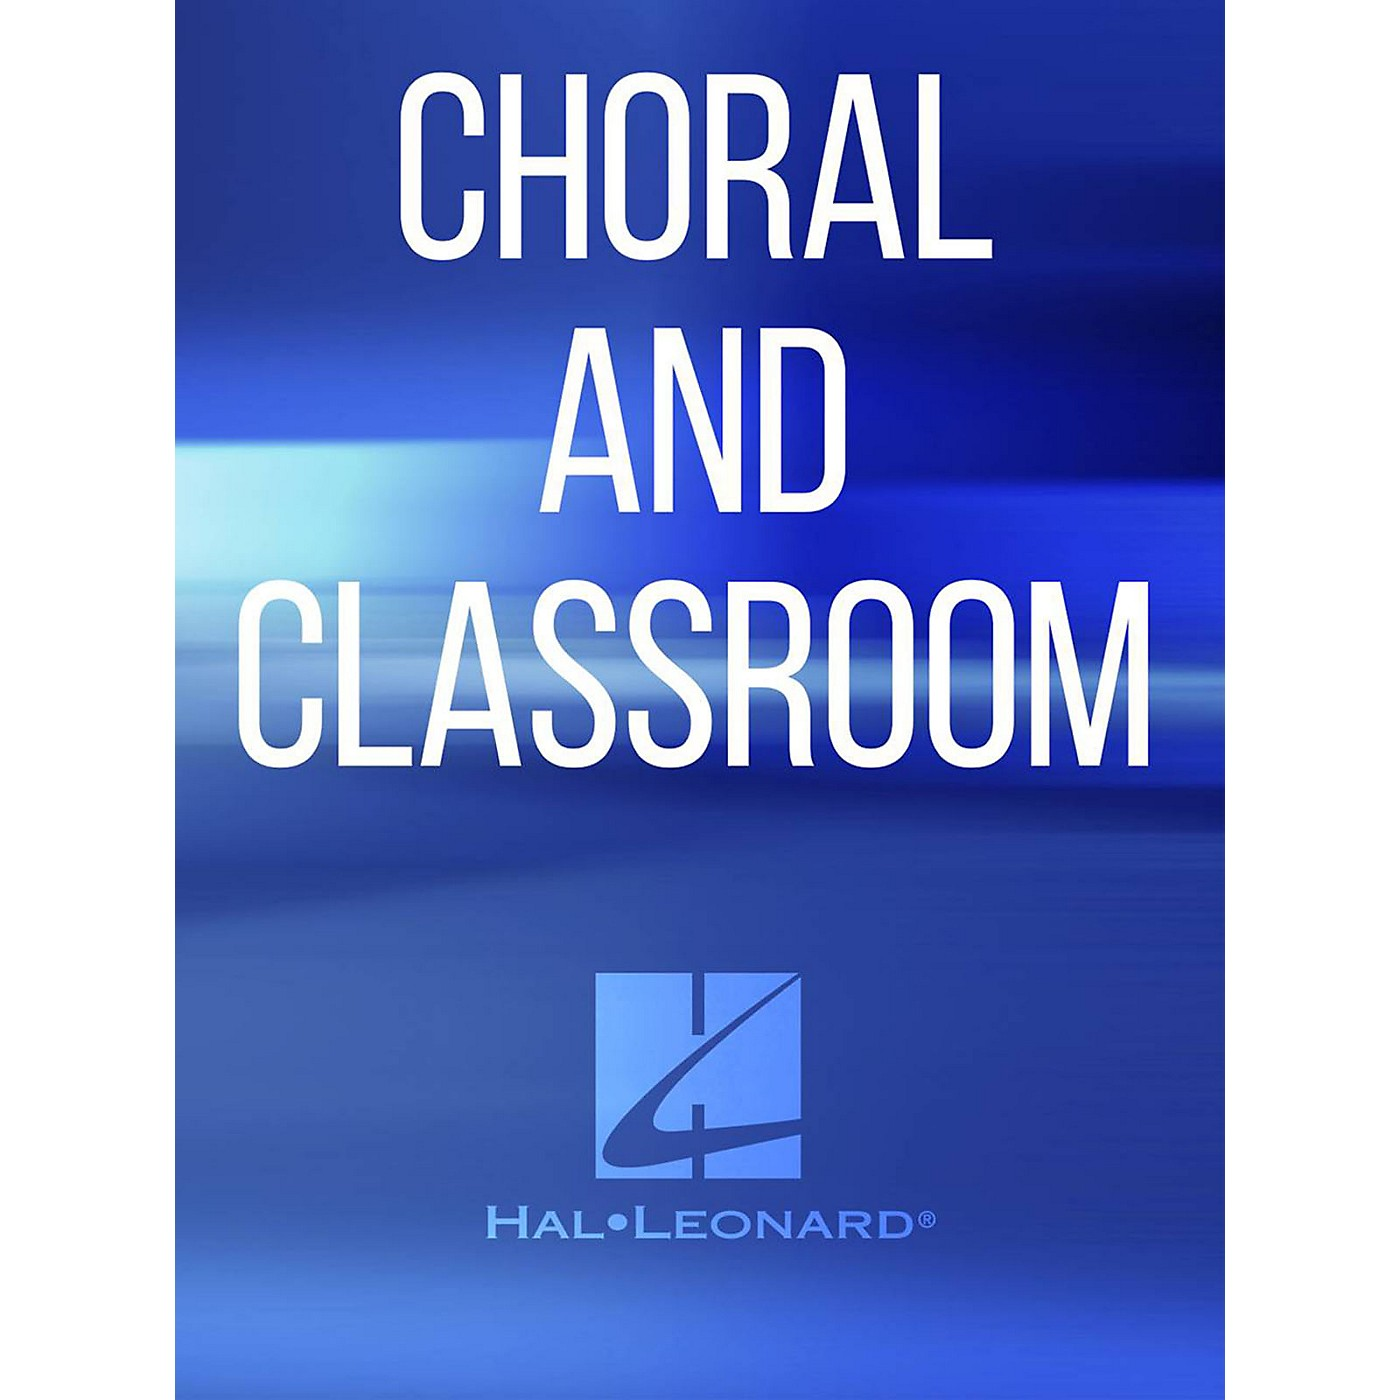 Hal Leonard Volume 34: Works for Chorus (Unaccompanied and with Piano) (Full Score) Score by Dmitri Shostakovich thumbnail